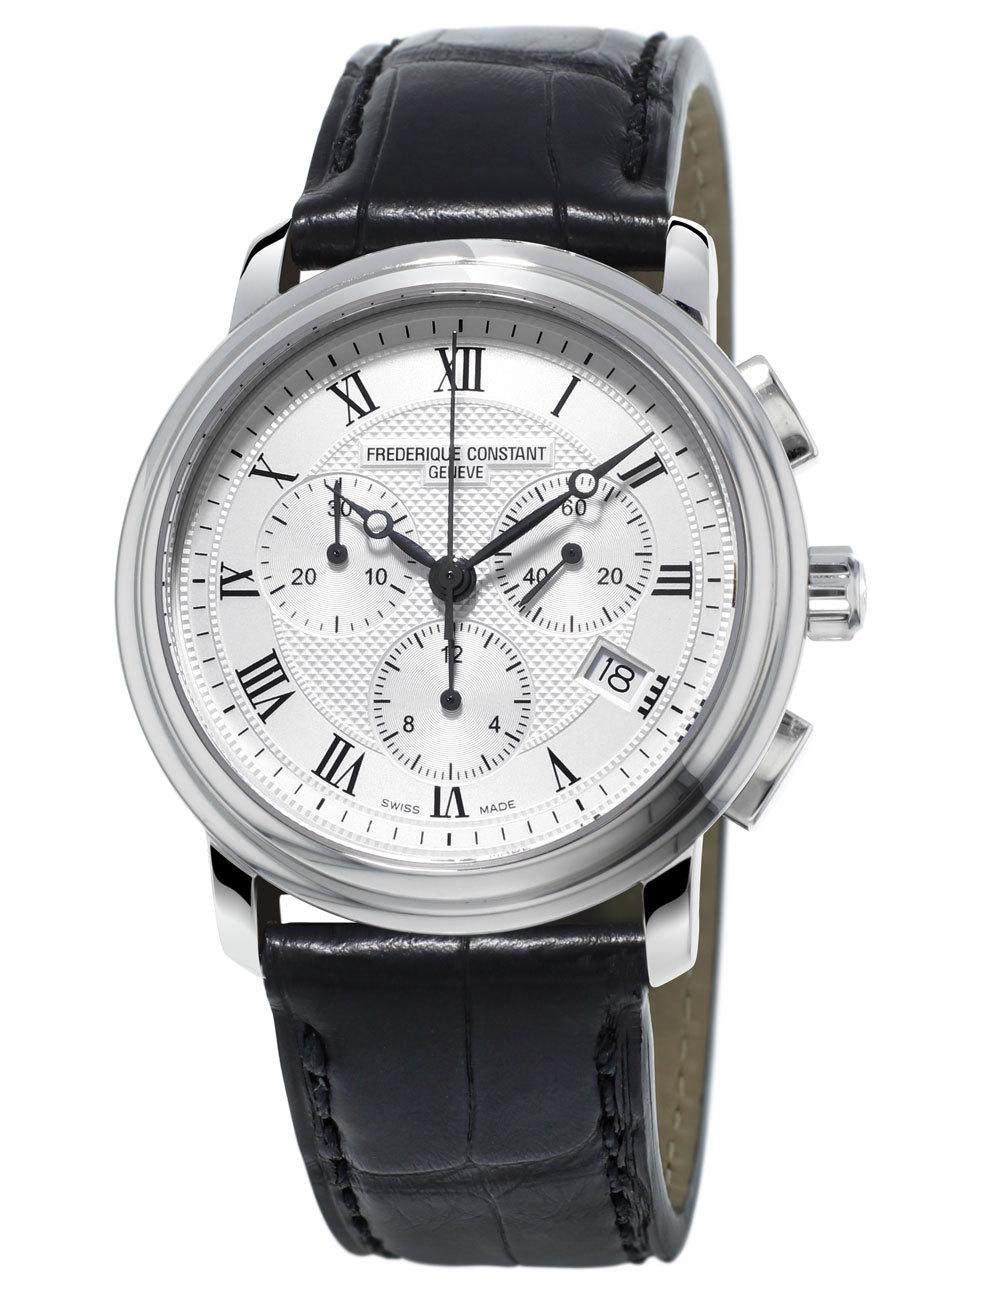 Часы мужские Frederique Constant FC-292MC4P6 Classics